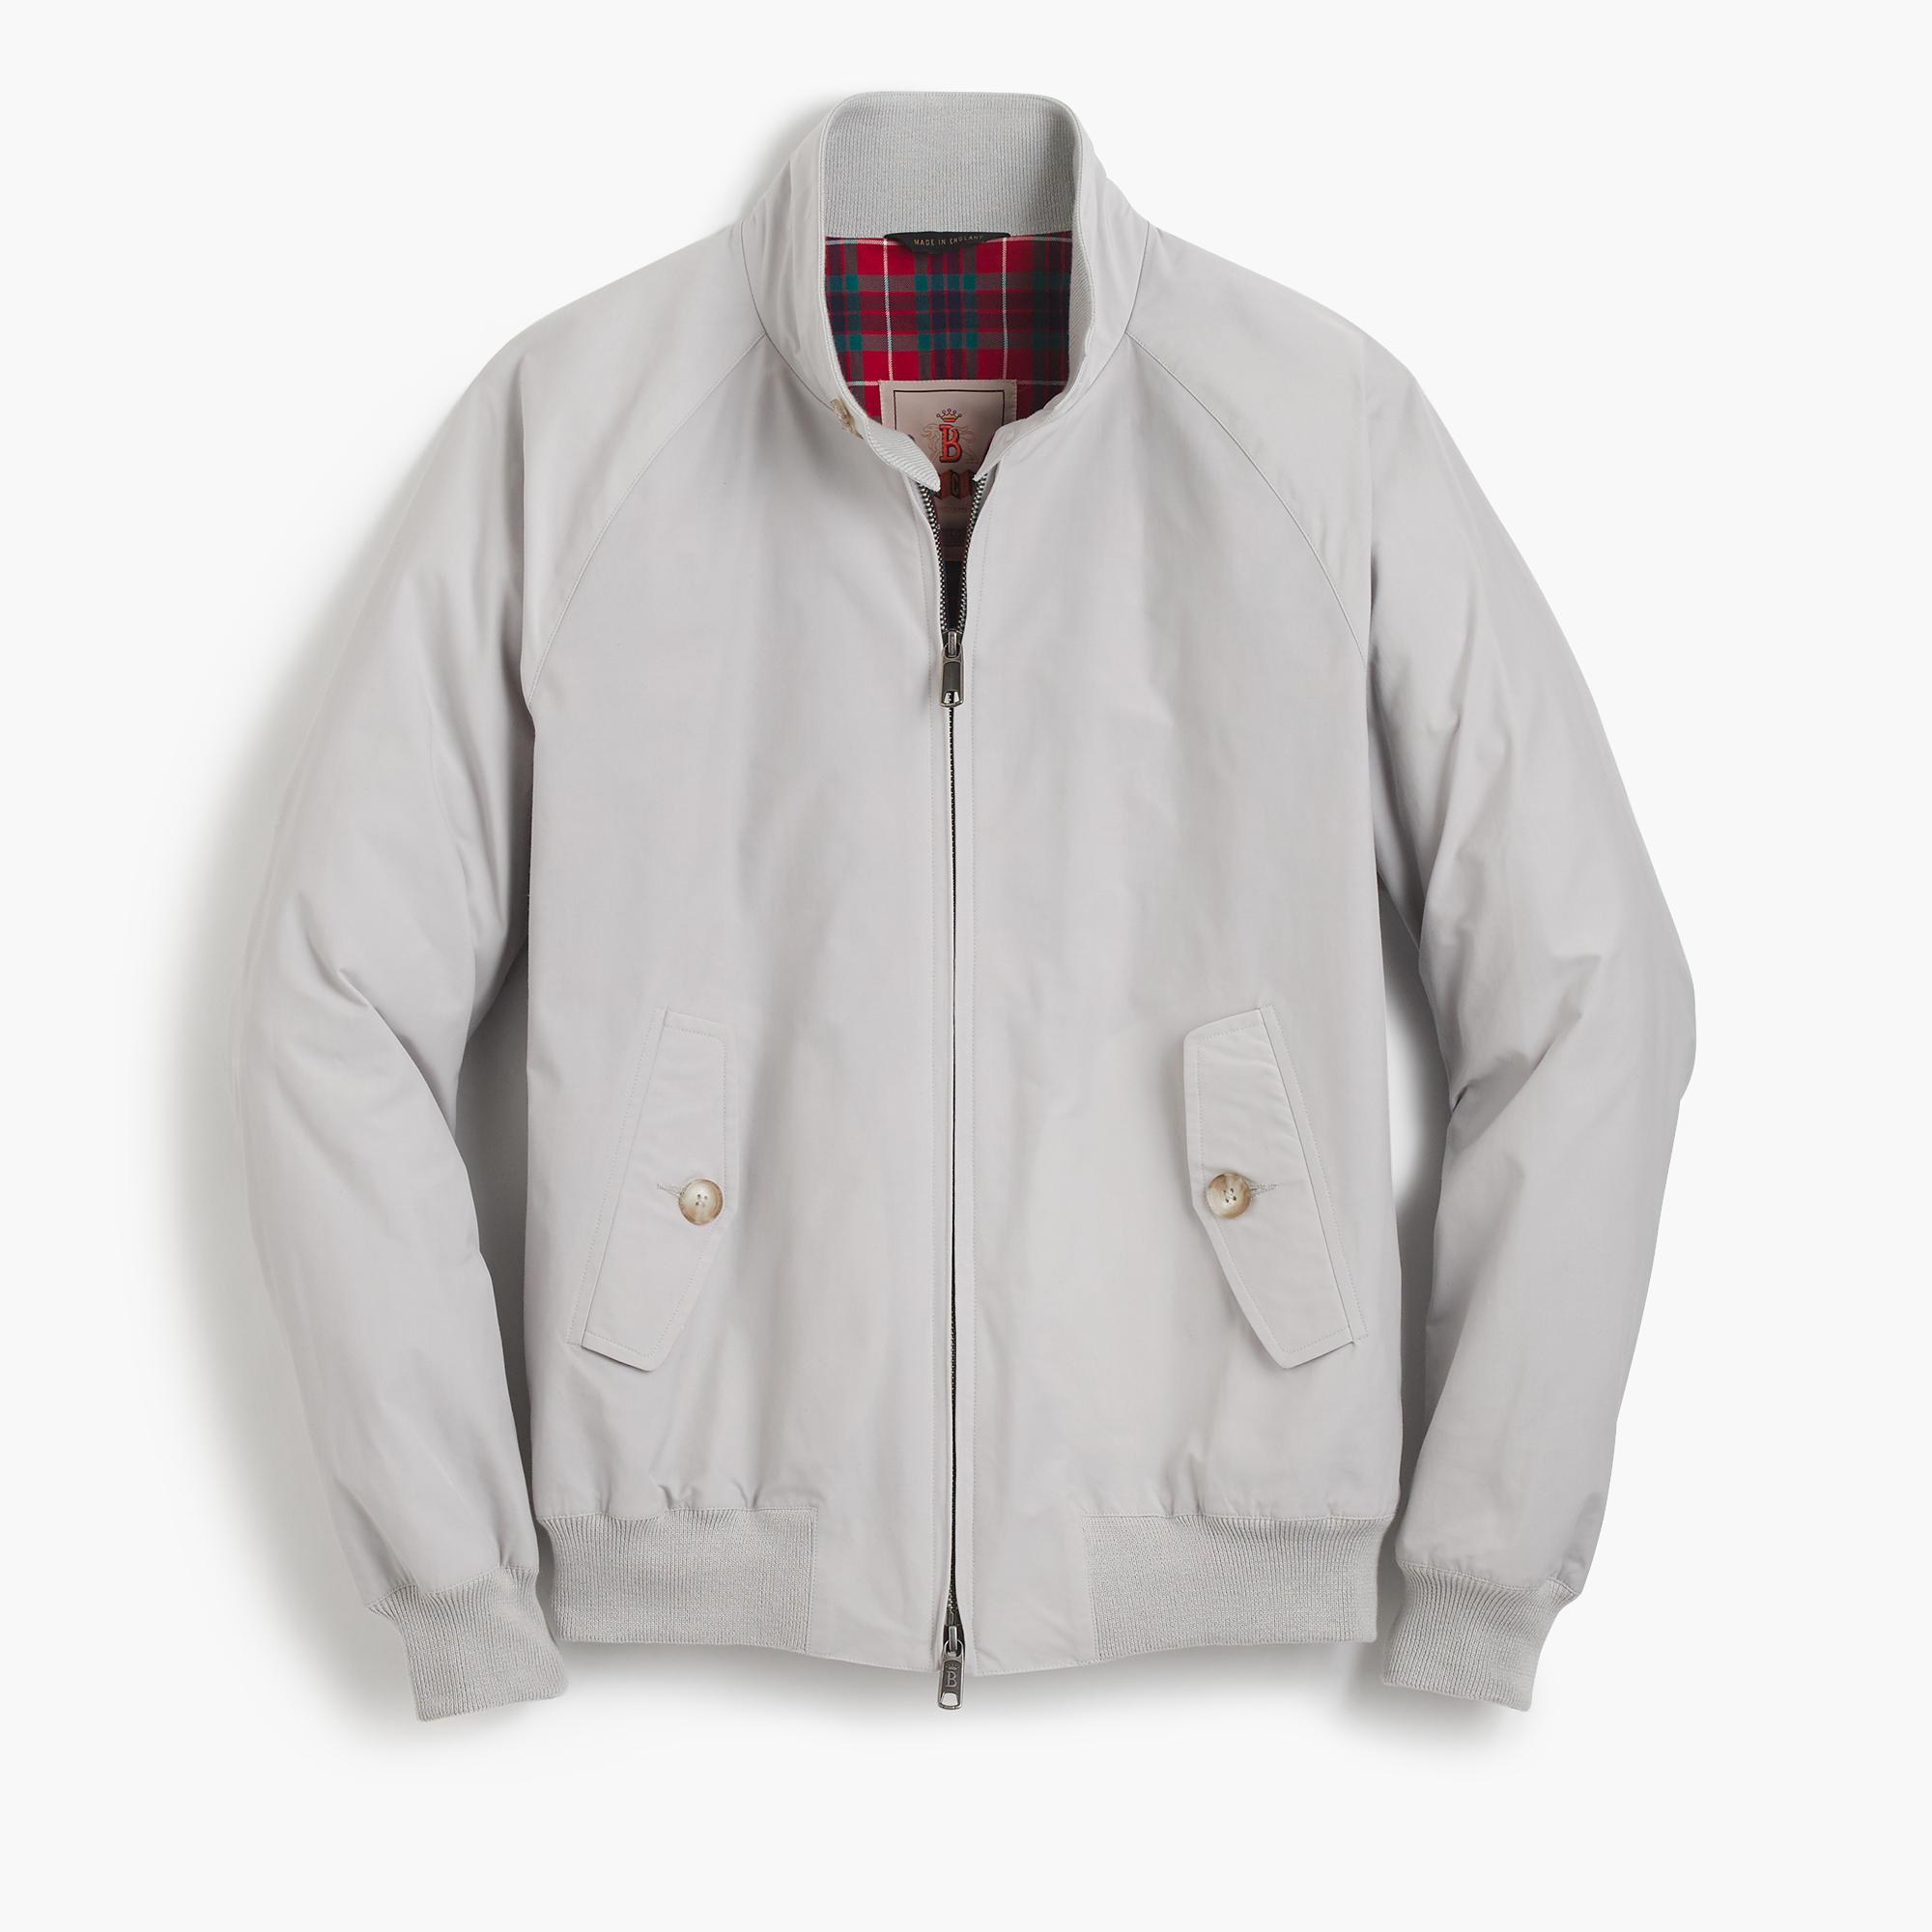 Baracuta Jacket Fit? | Styleforum